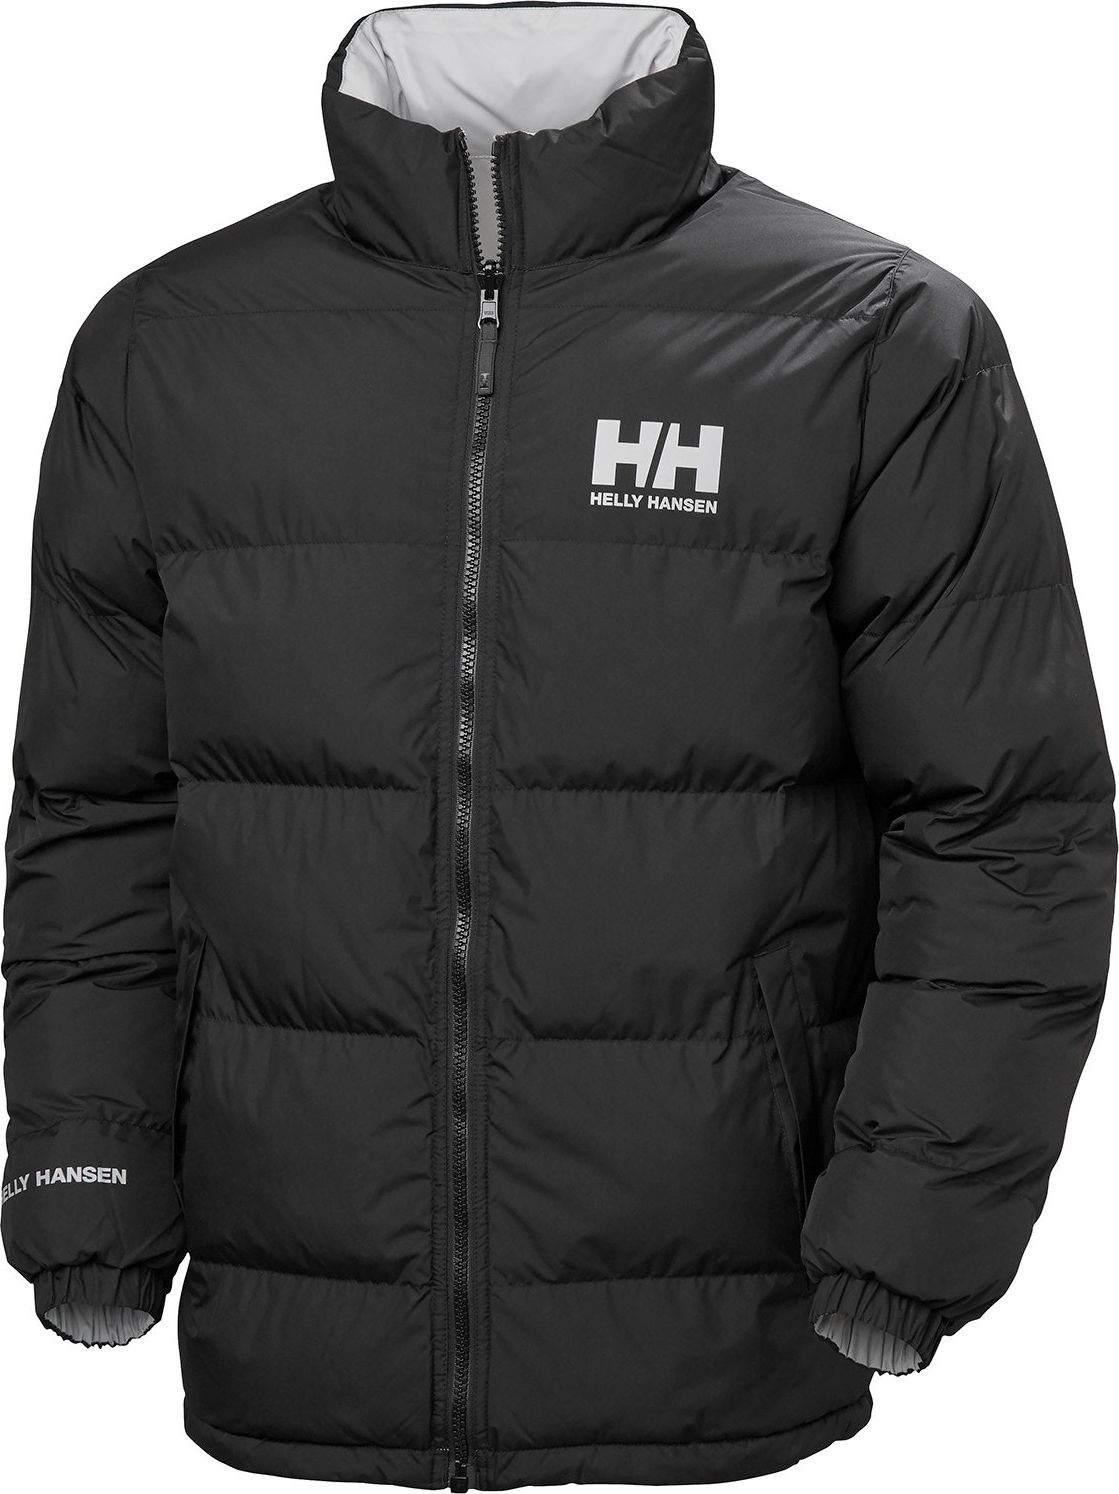 HELLY HANSEN Urban Reversible Jacket Black M